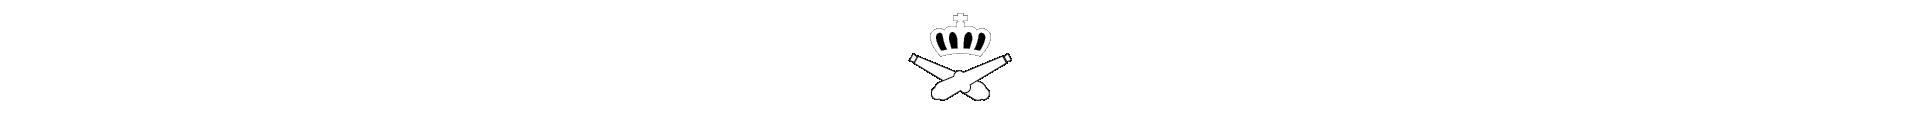 canon-crown-break.png